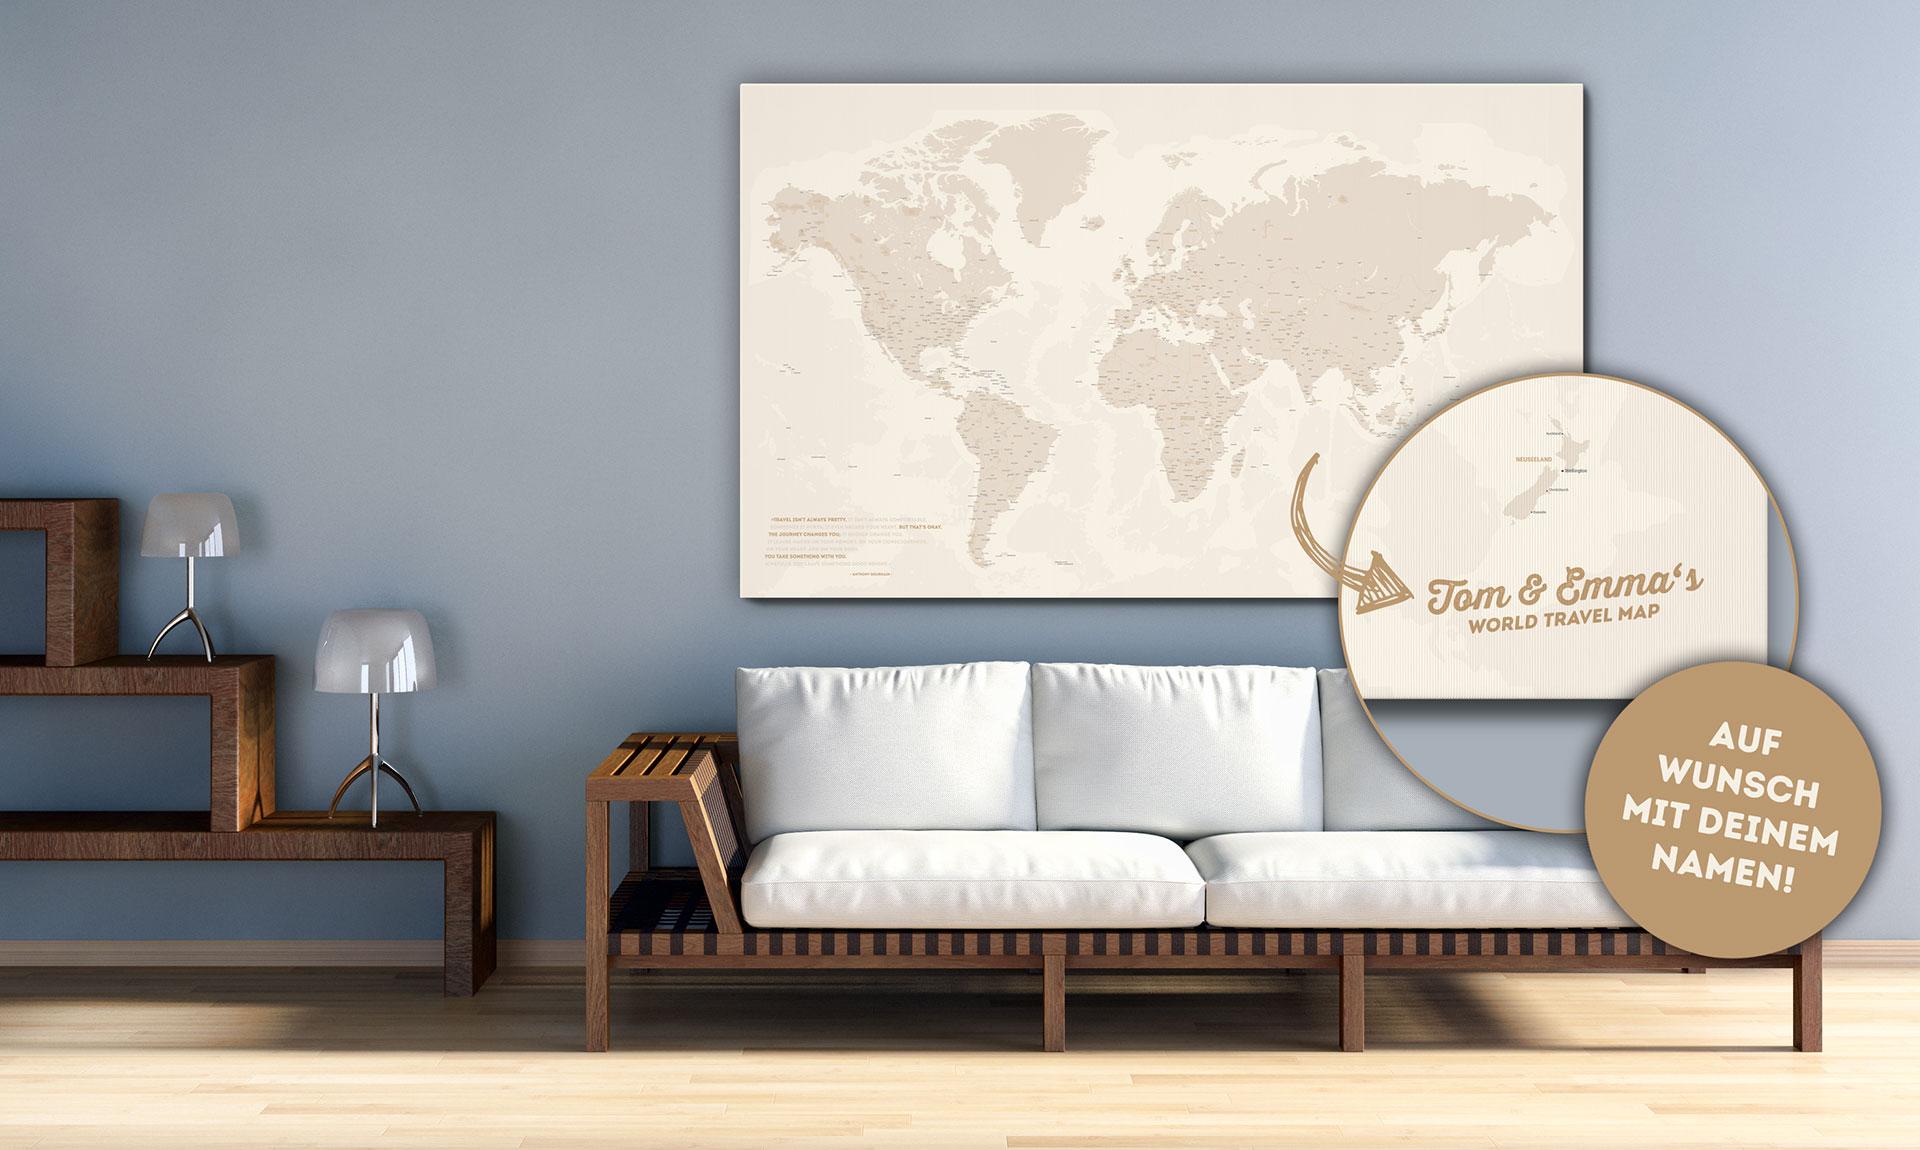 Full Size of Pinnwand Modern Küche Weltkarte Als Individuell Produziert Breuers Reiseblog Abfalleimer Moderne Landhausküche Thekentisch Ikea Kosten Billig Single Wellmann Wohnzimmer Pinnwand Modern Küche